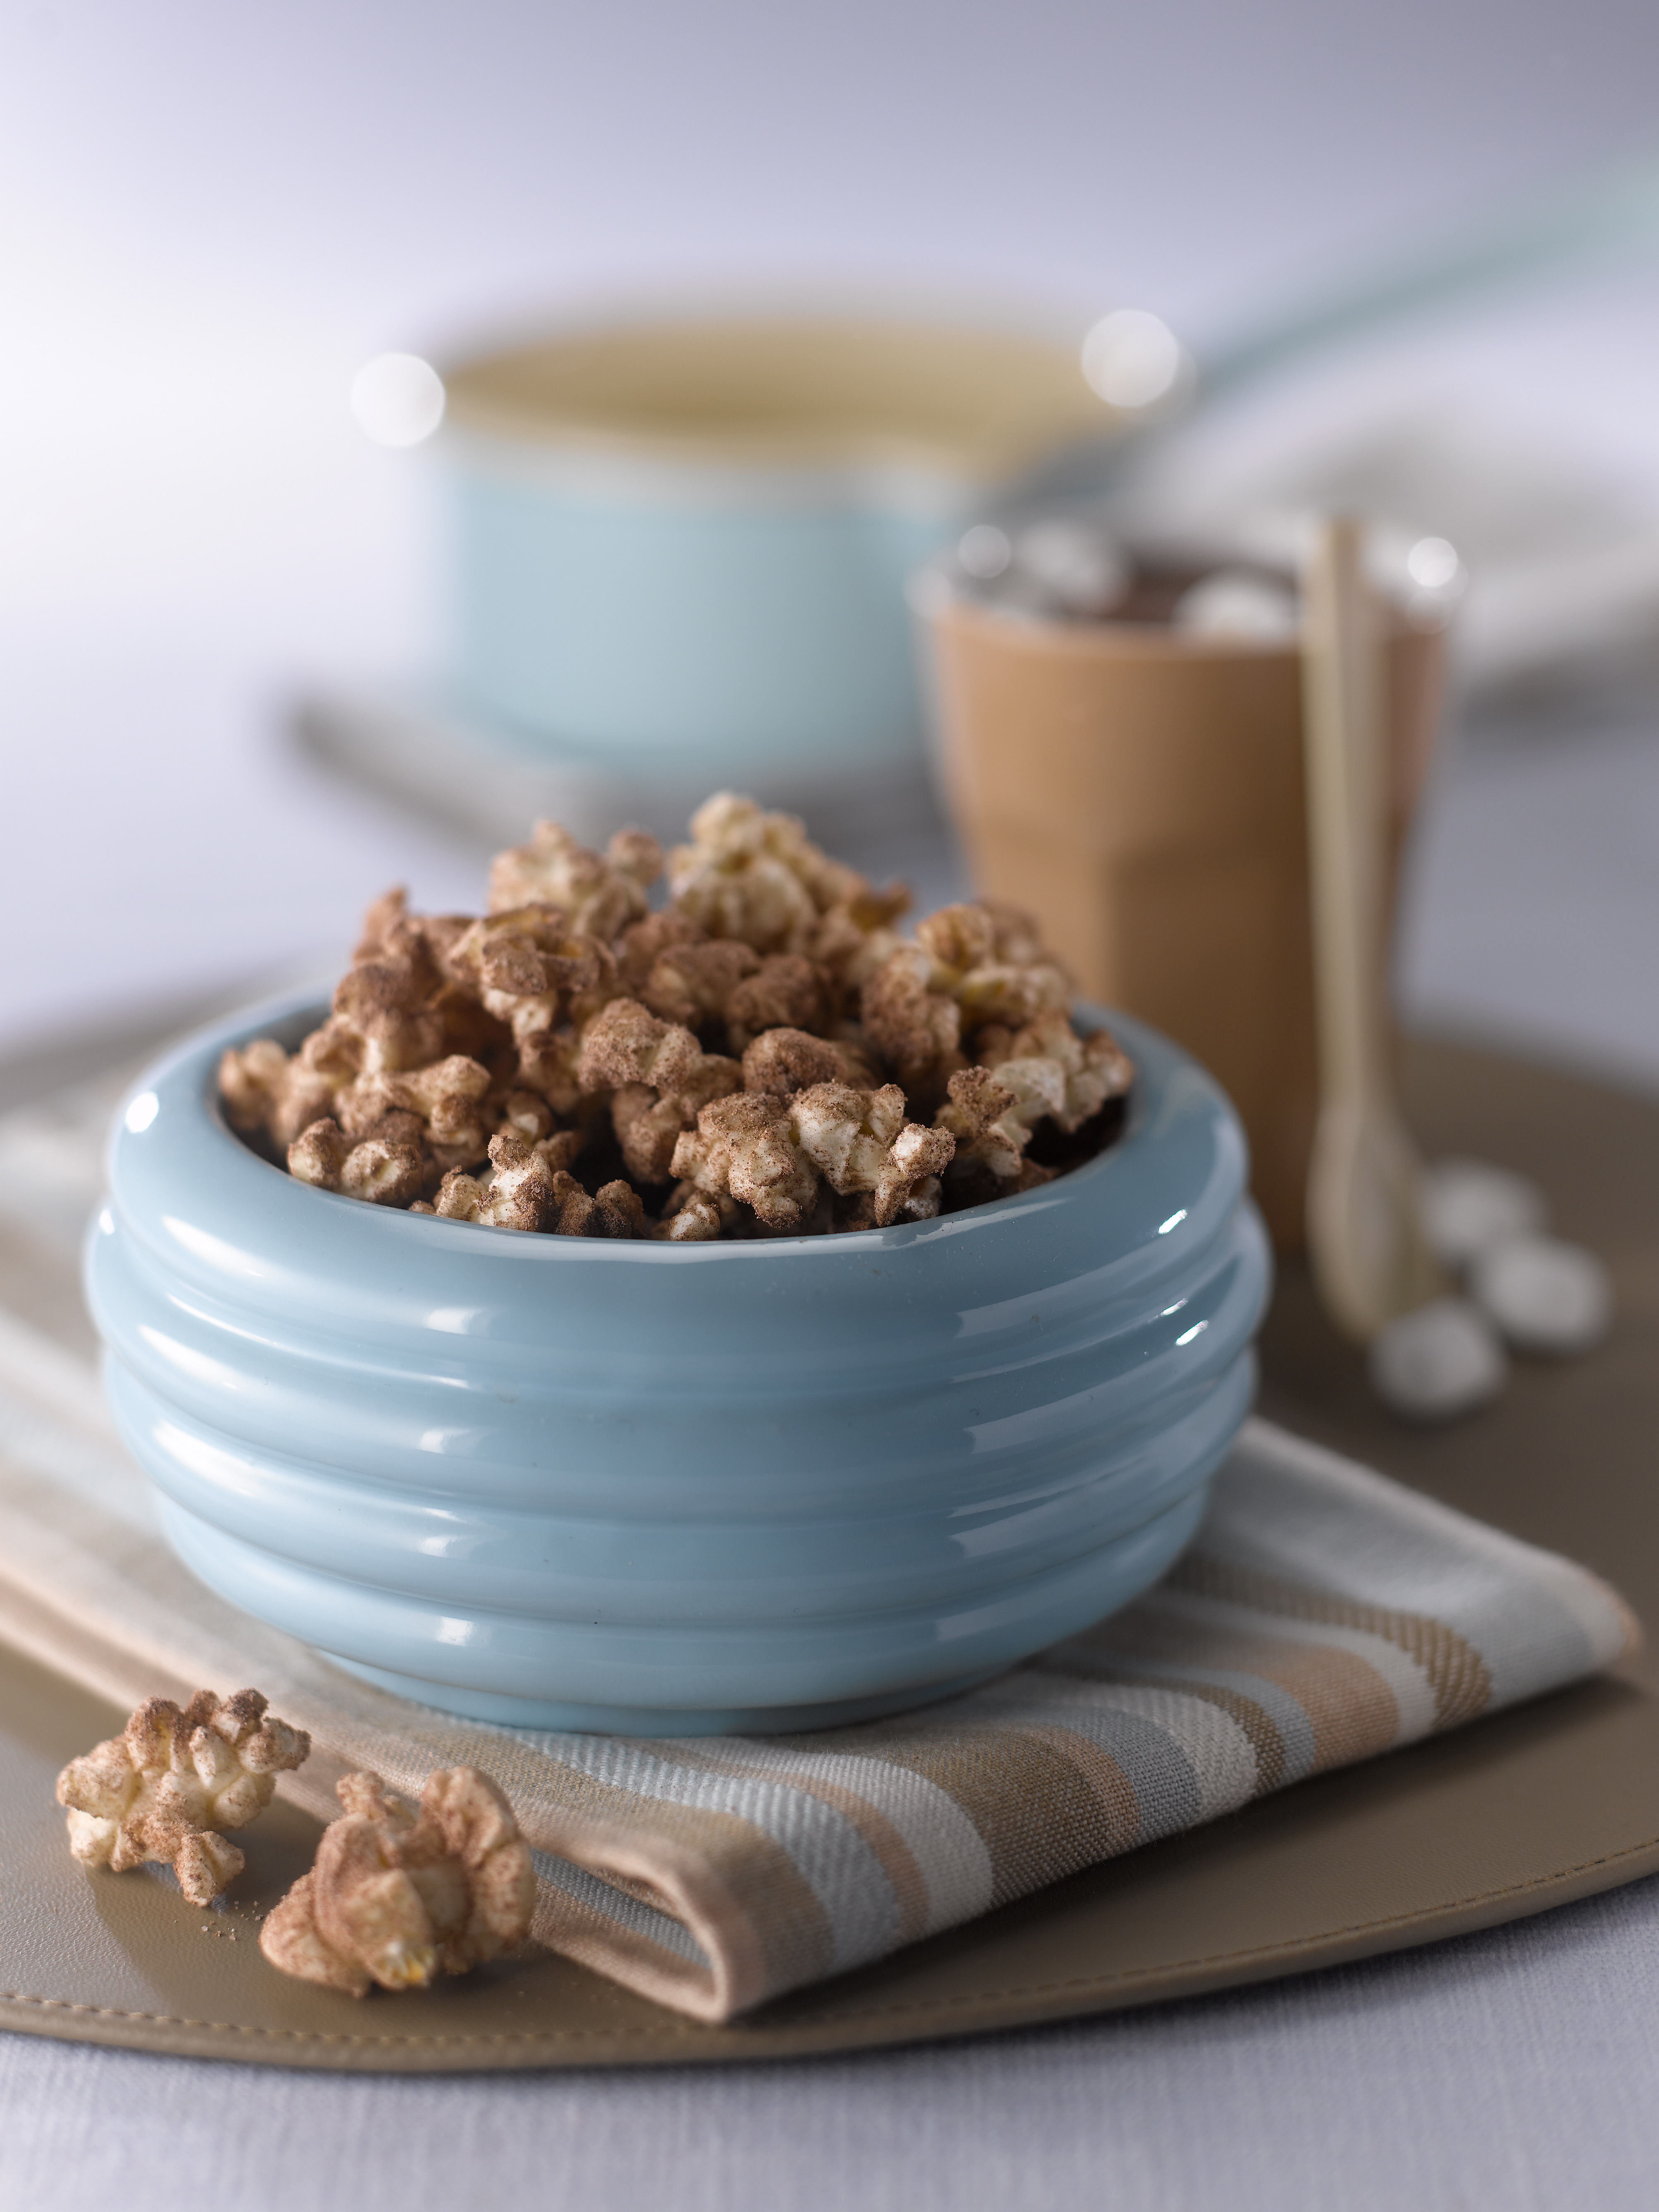 Cinnamon Chocolate Popcorn